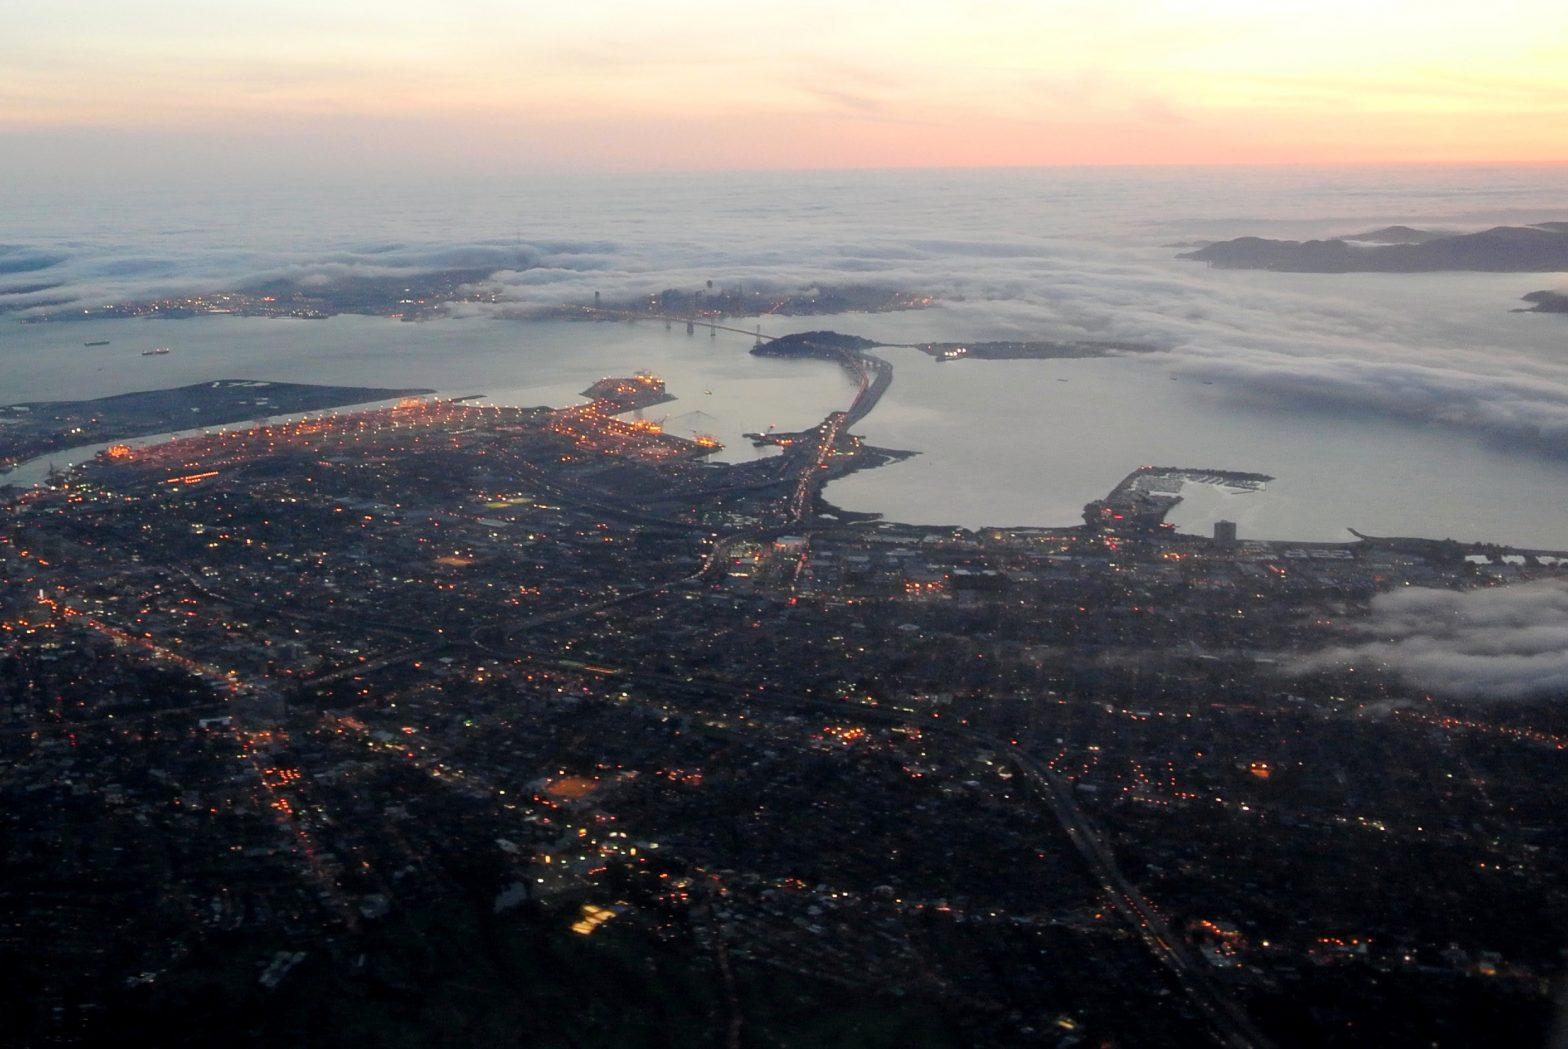 east_bay_aerial_twilight.jpg